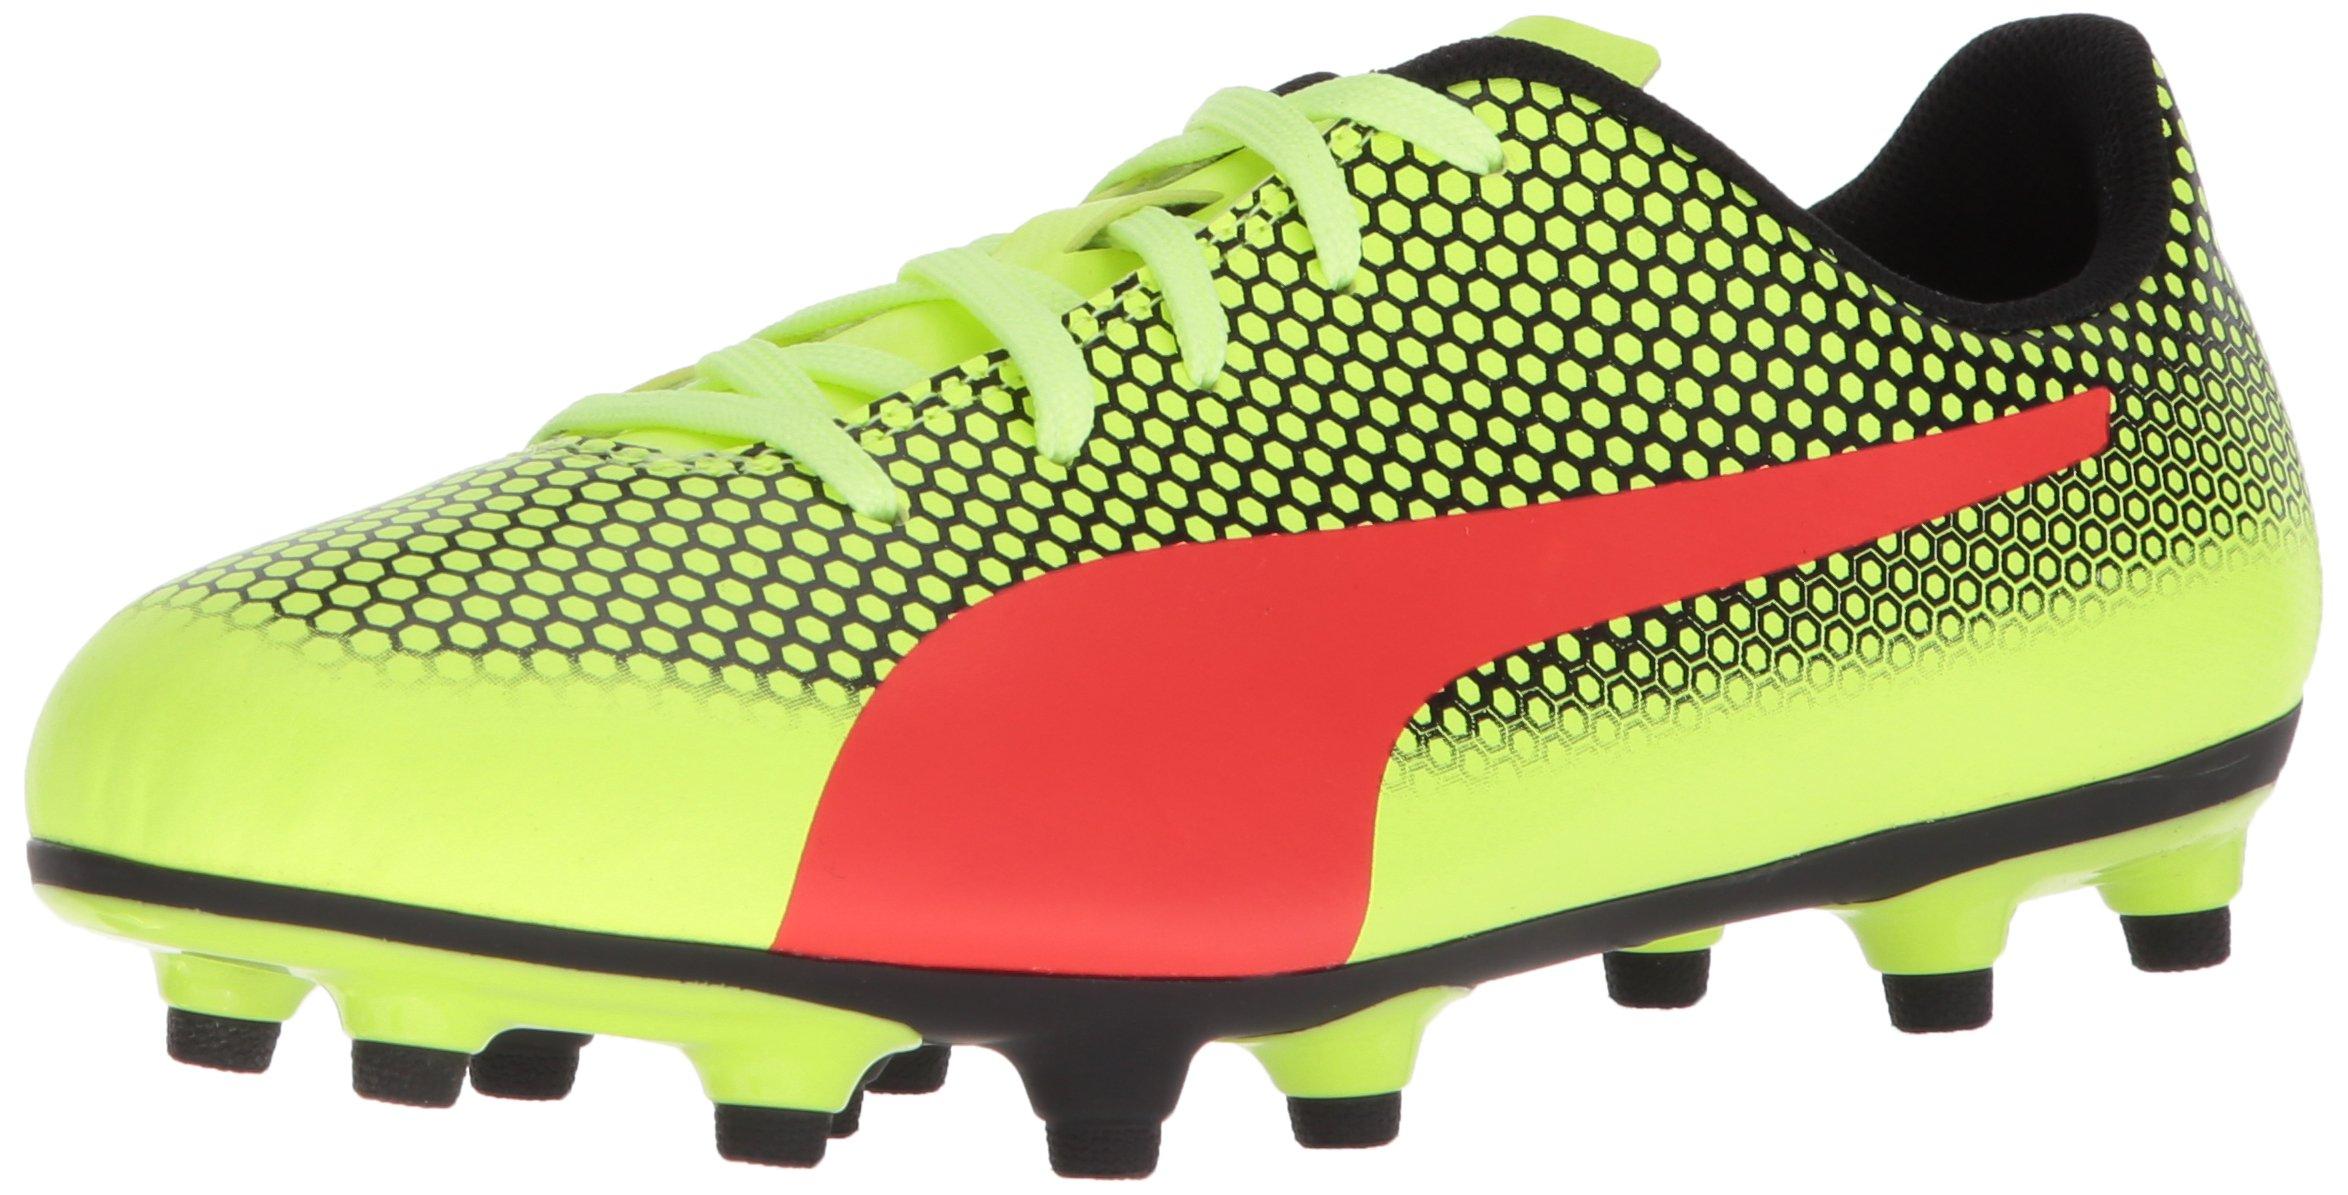 PUMA Unisex-Kids Spirit FG Soccer-Shoes, Fizzy Yellow-Red Blast Black, 5 M US Big Kid